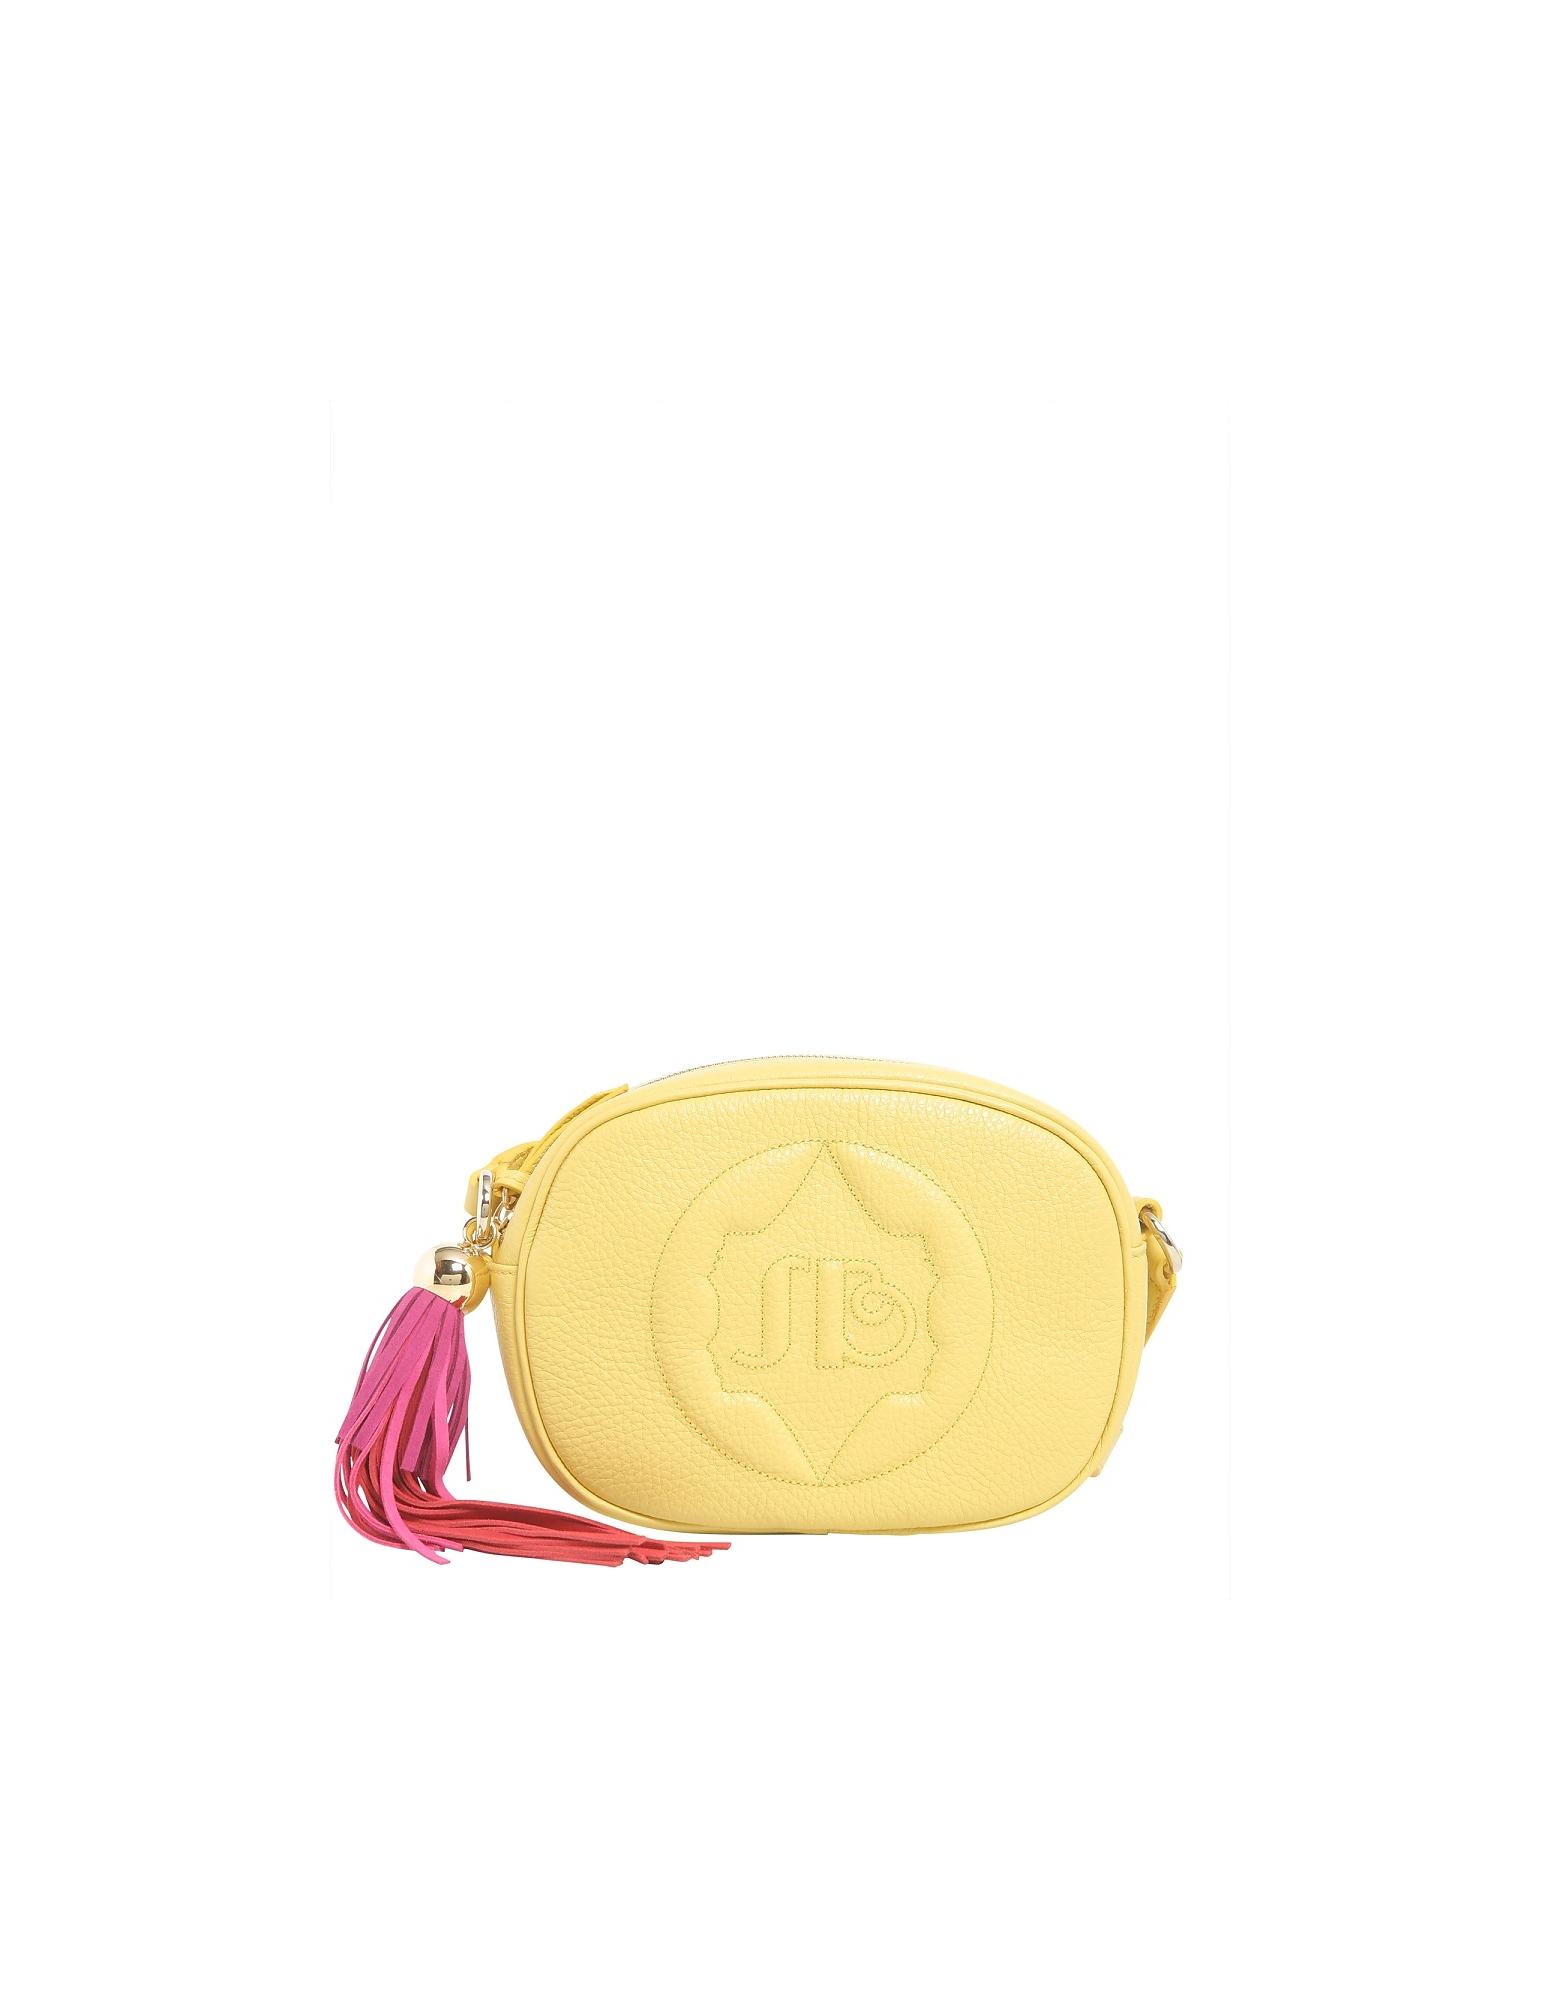 Sara Battaglia Designer Handbags, Sandy Crossbody Bag